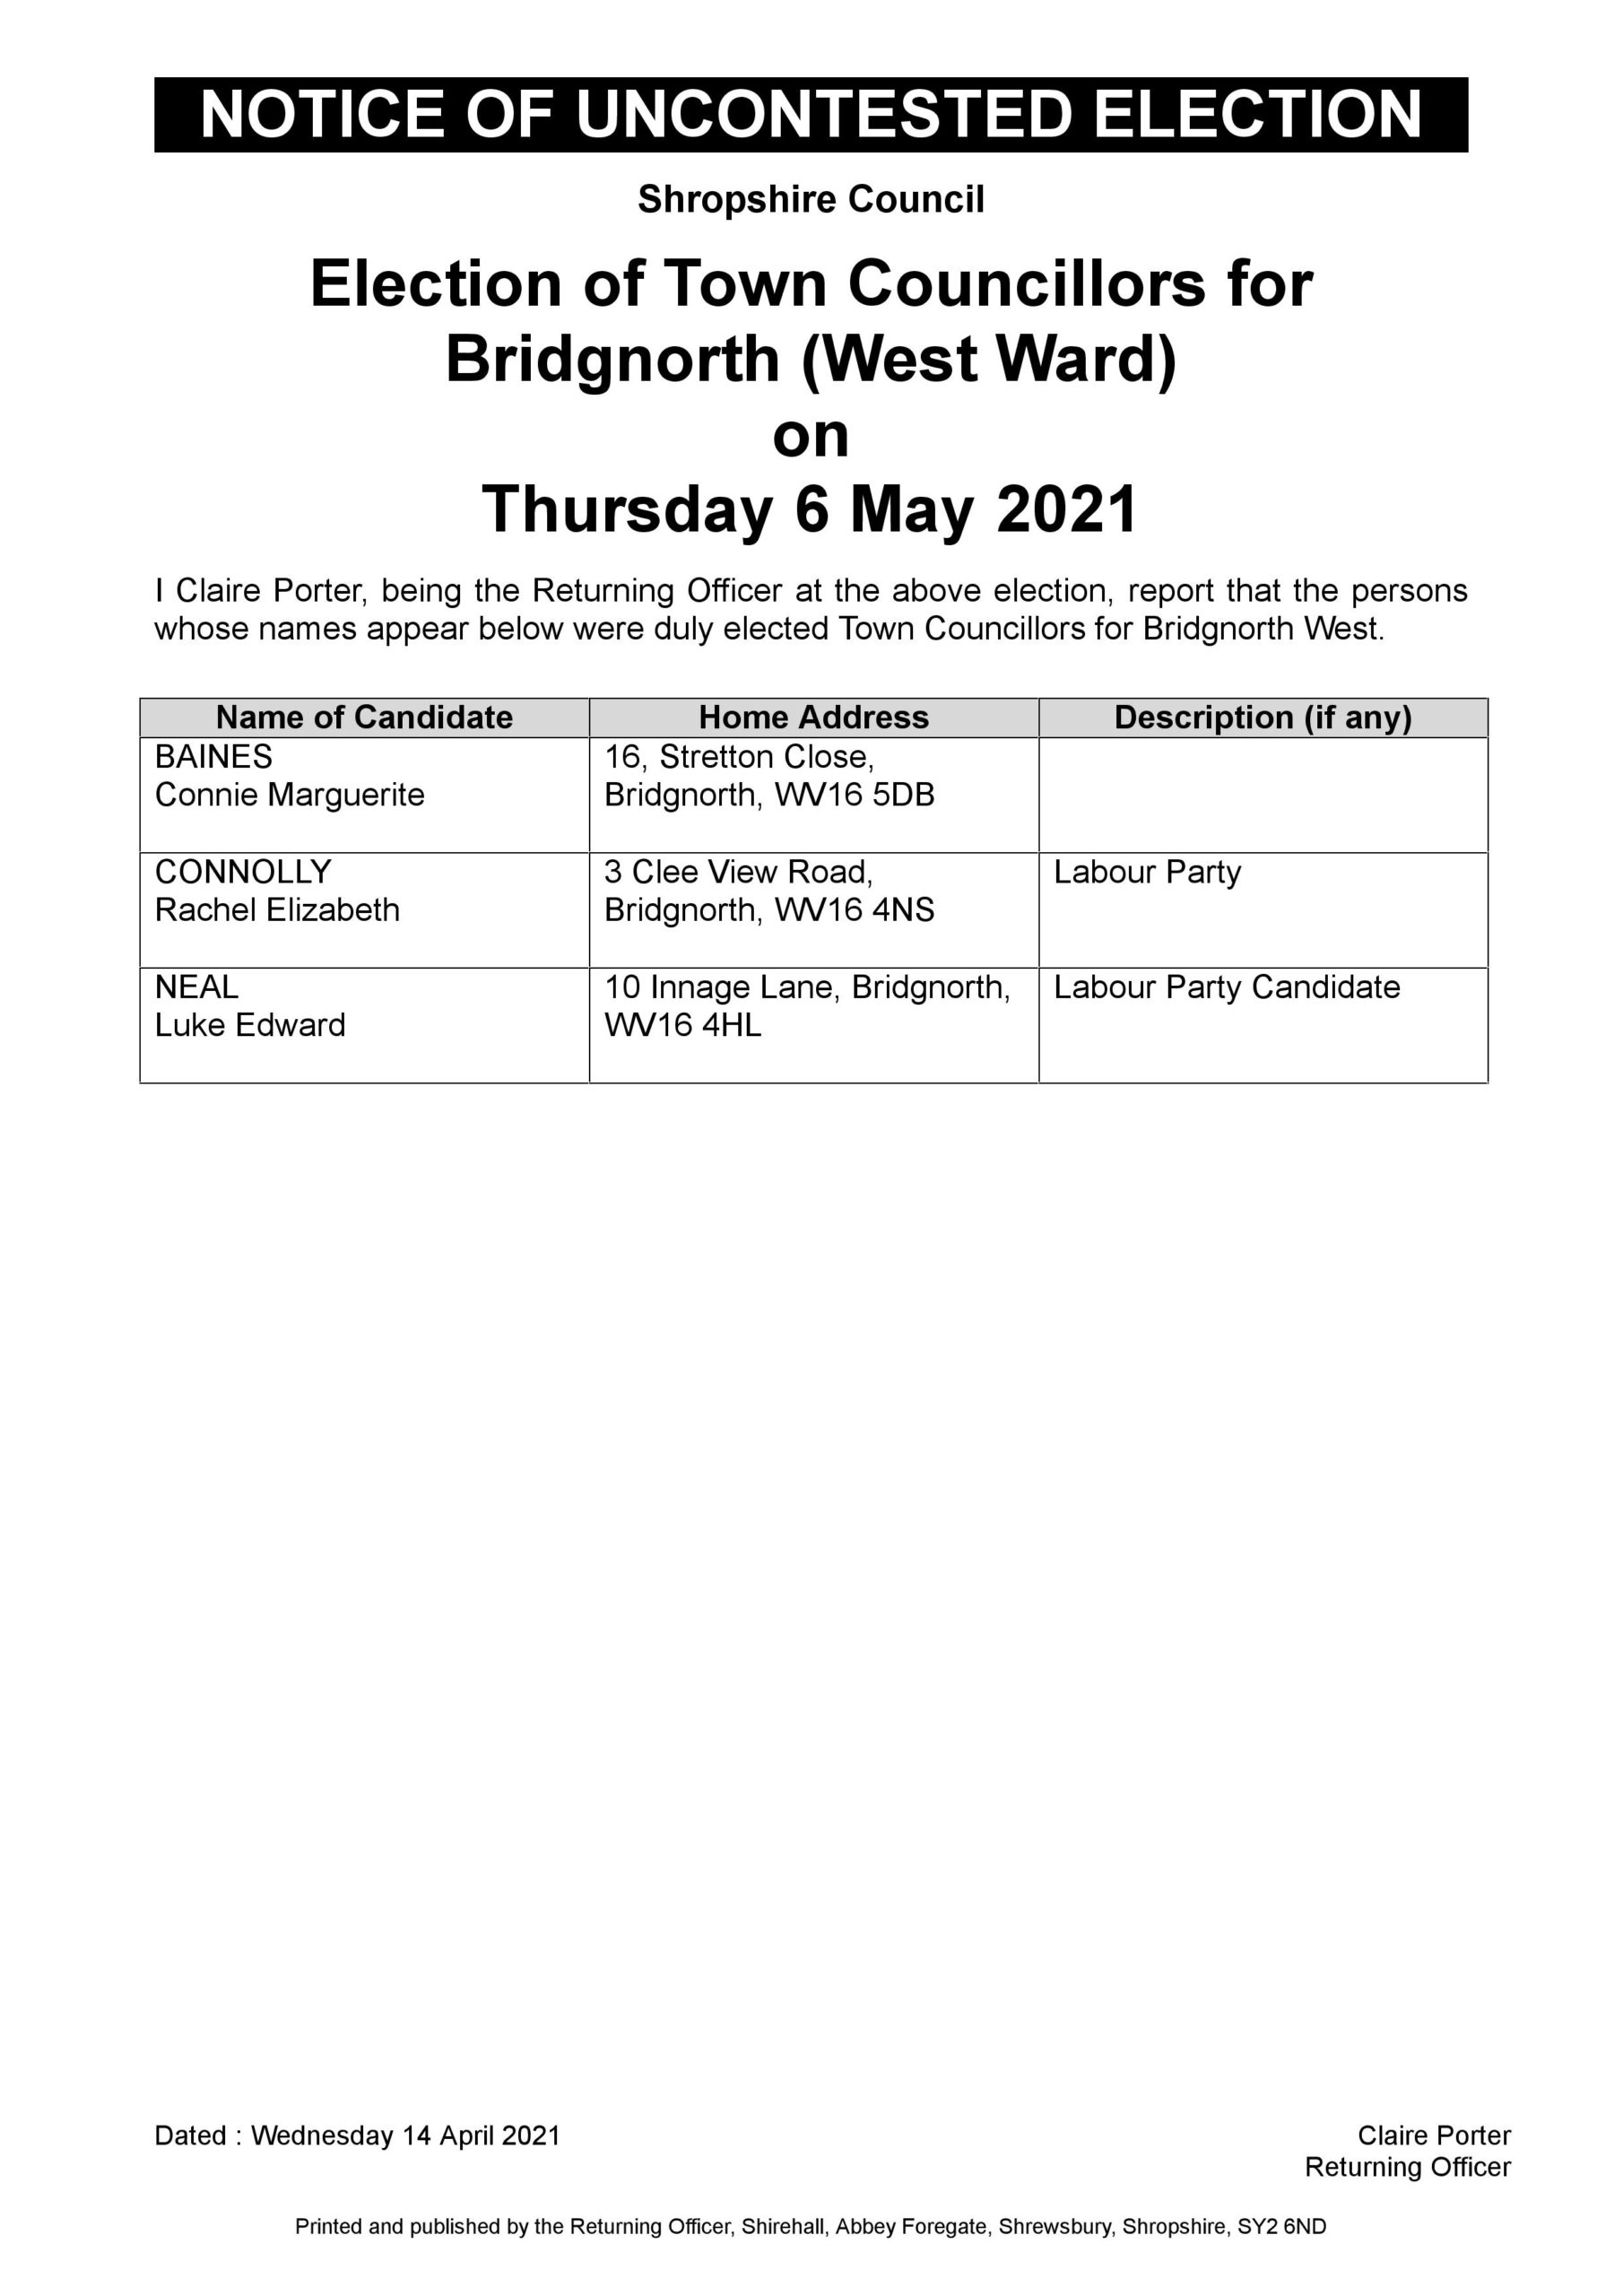 Uncontested Election Bridgnorth West